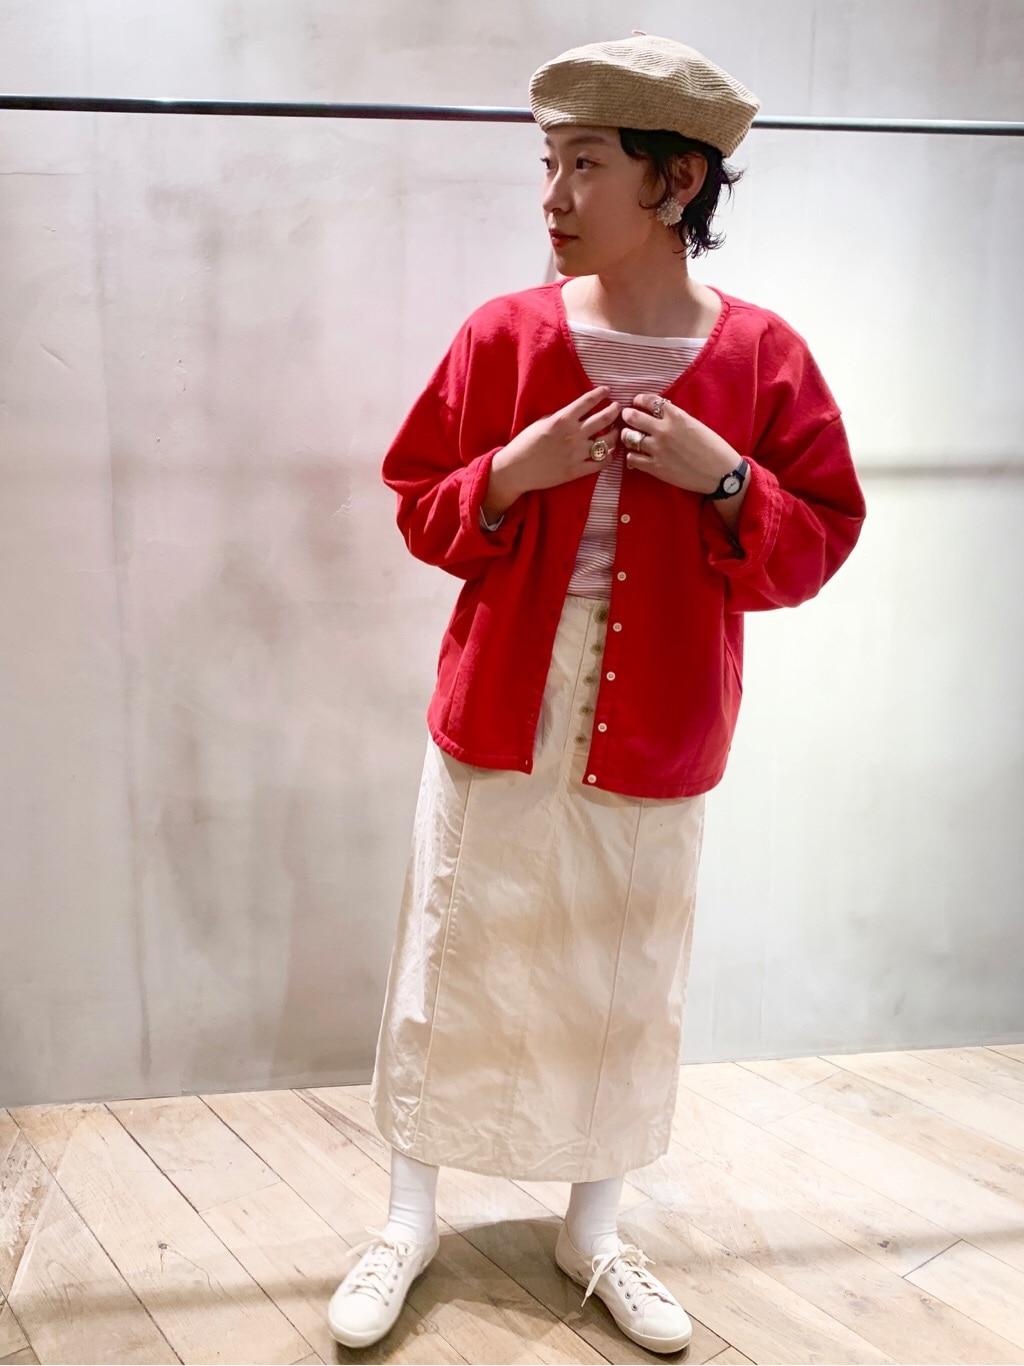 bulle de savon 新宿ミロード 身長:159cm 2020.03.28